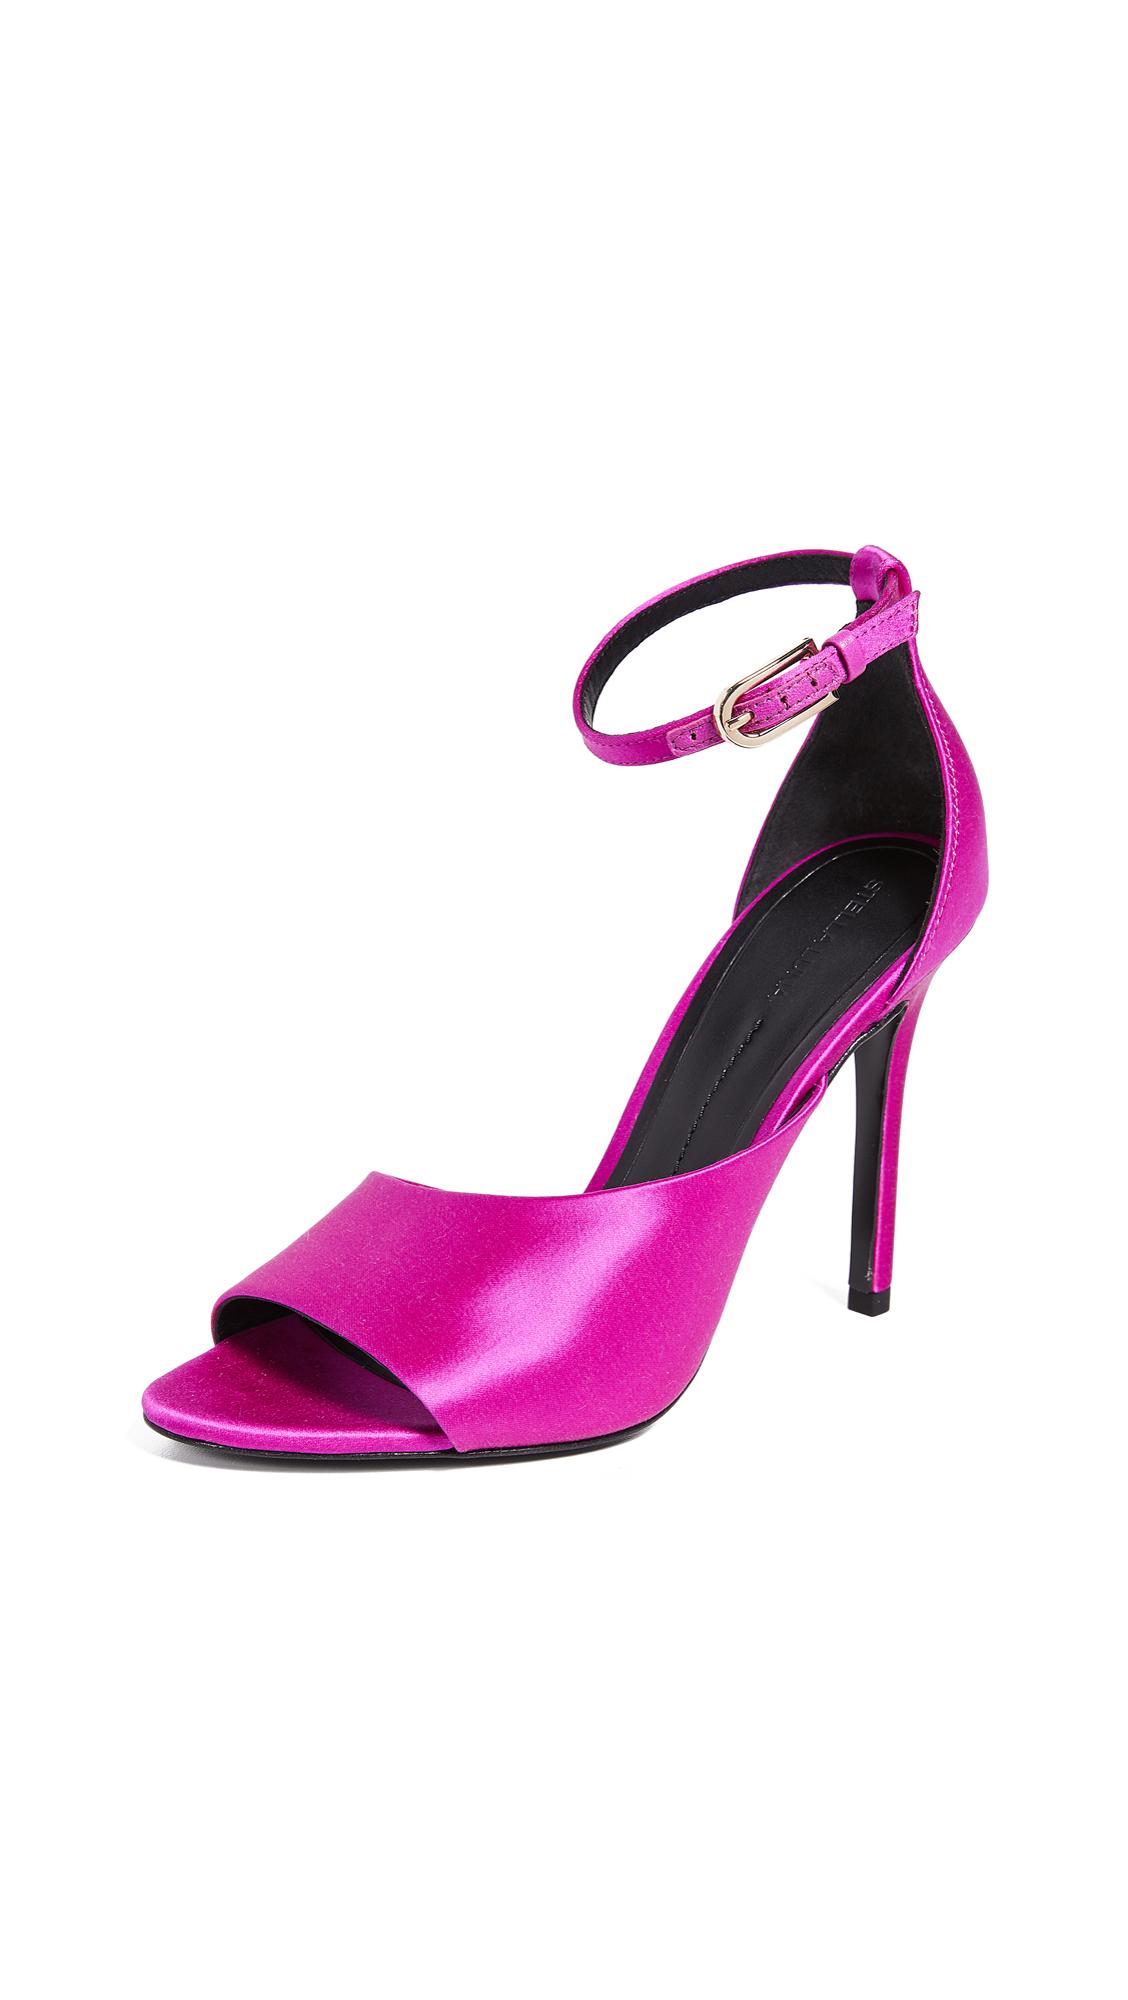 Stella Luna Asymmetrical Sandals - Fushia